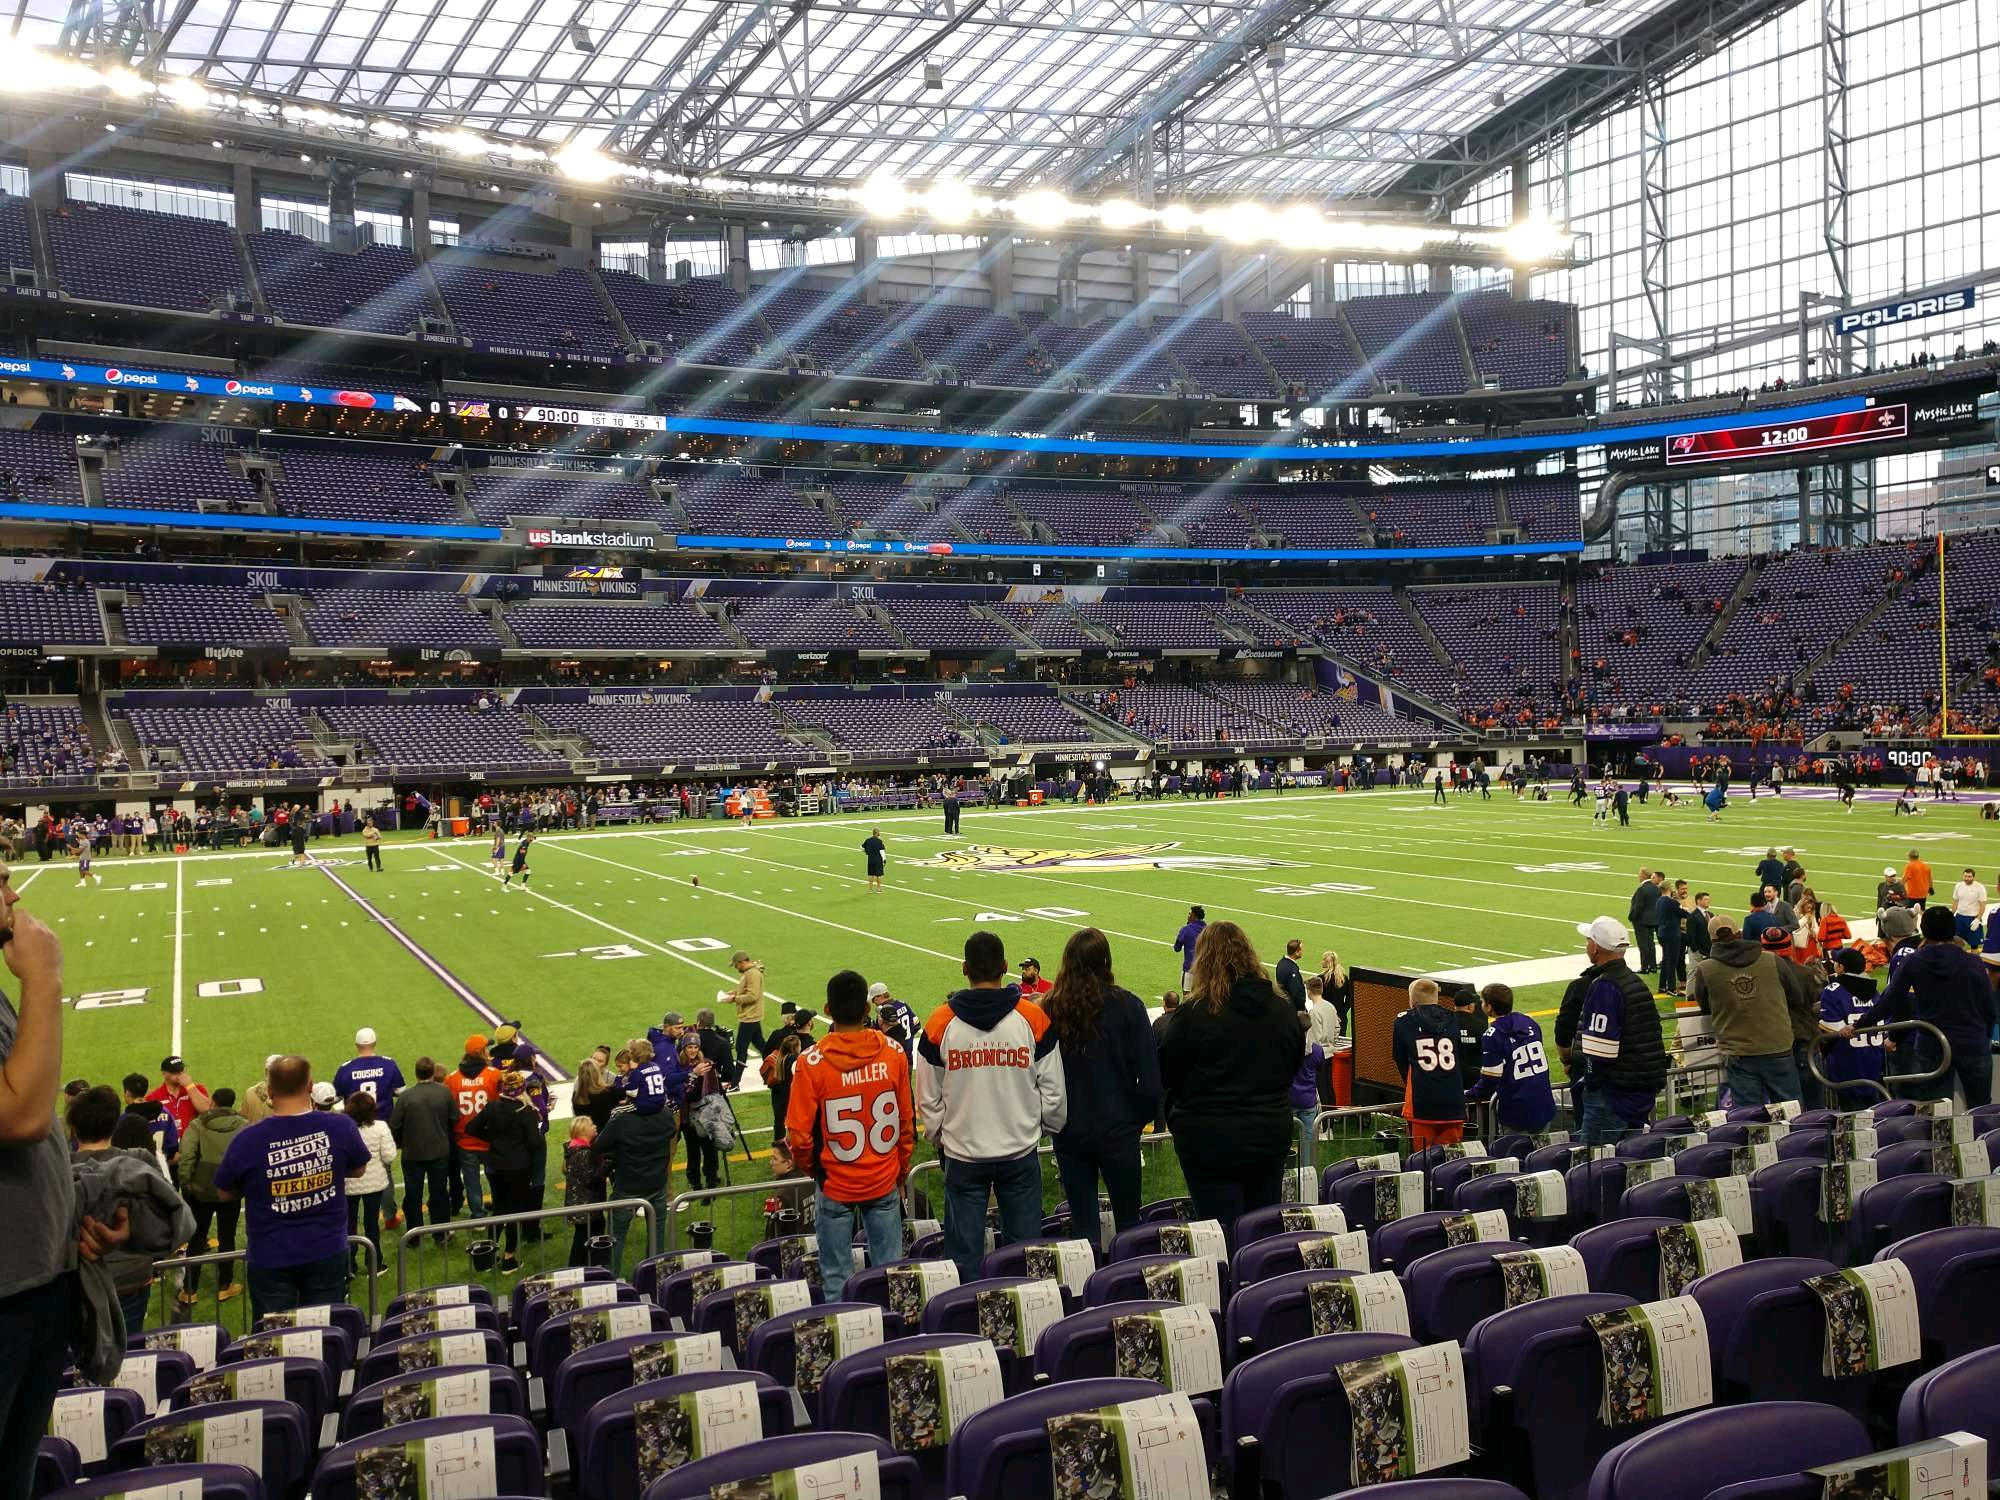 U.S. Bank Stadium Section 111 Row 9 Seat 7